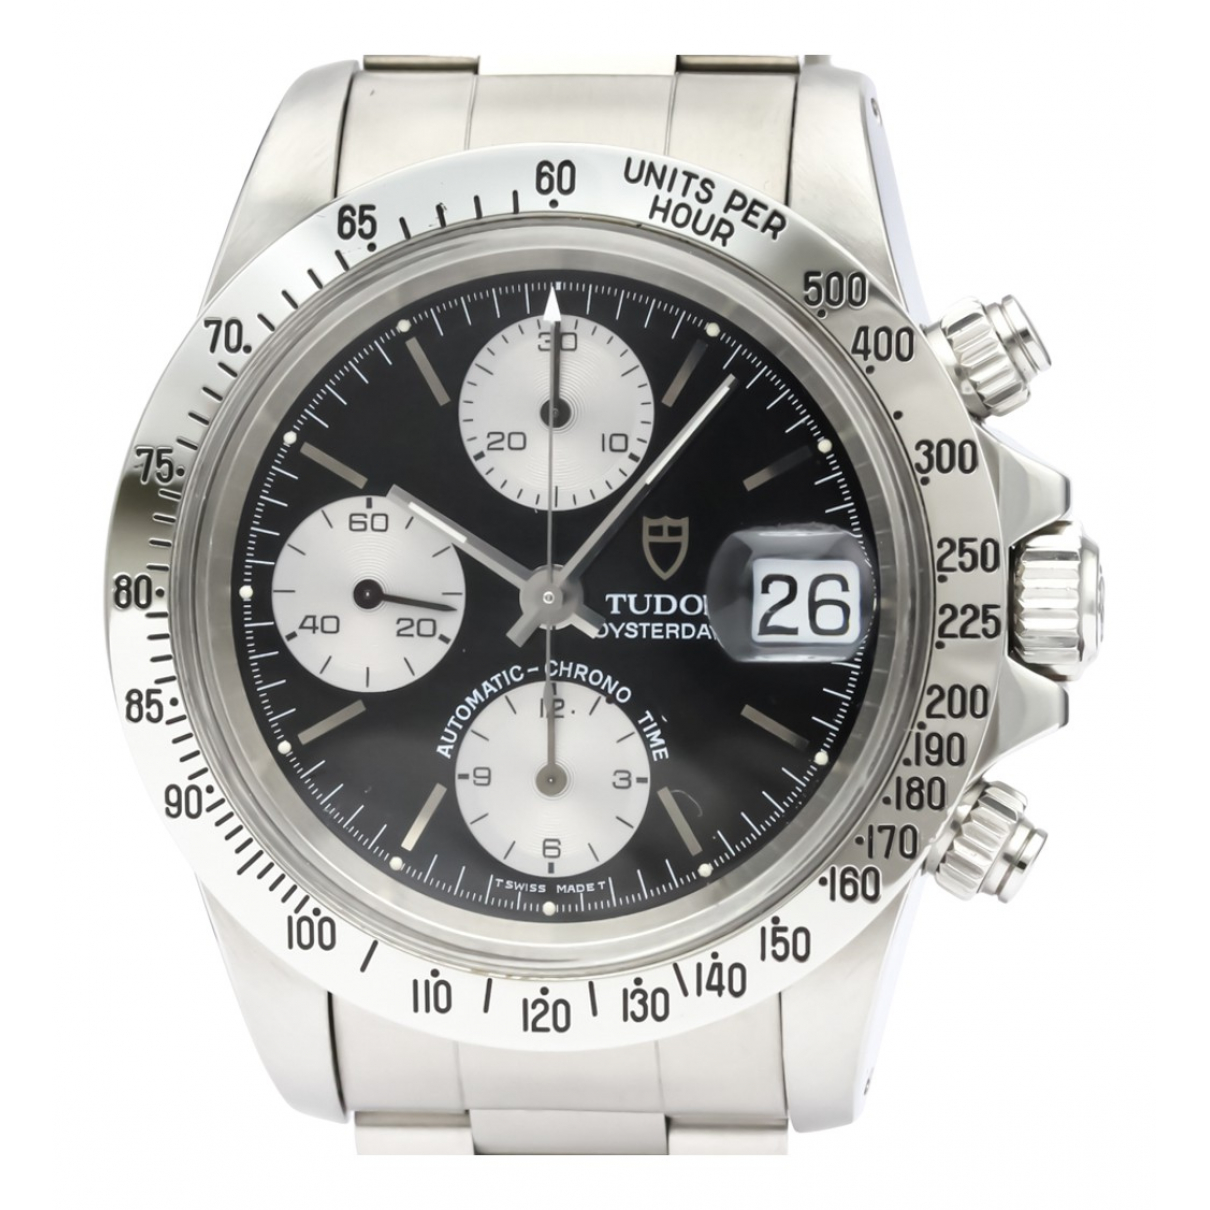 Relojes Tiger Prince Date Tudor